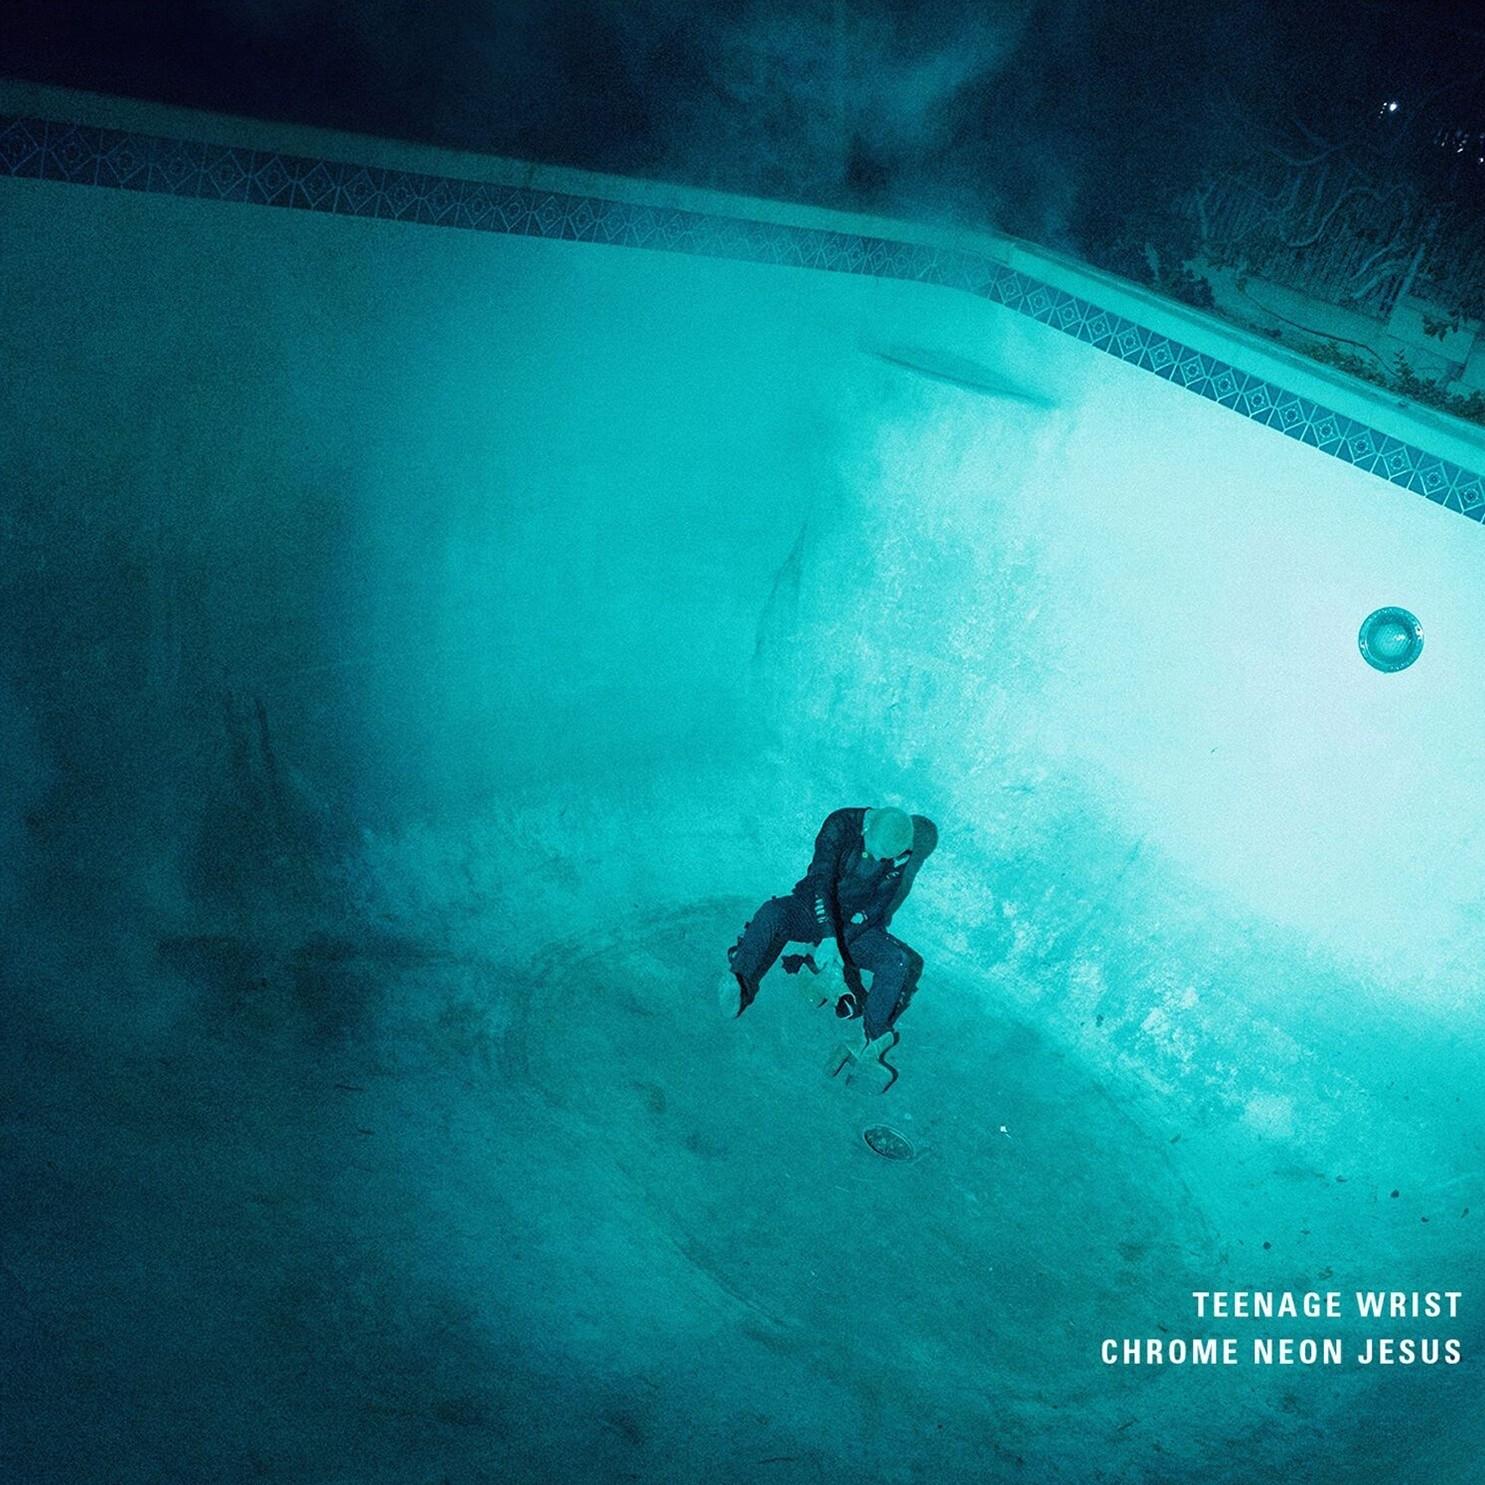 Teenage Wrist - Chrome Neon Jesus (Pale Yellow) Vinyl LP